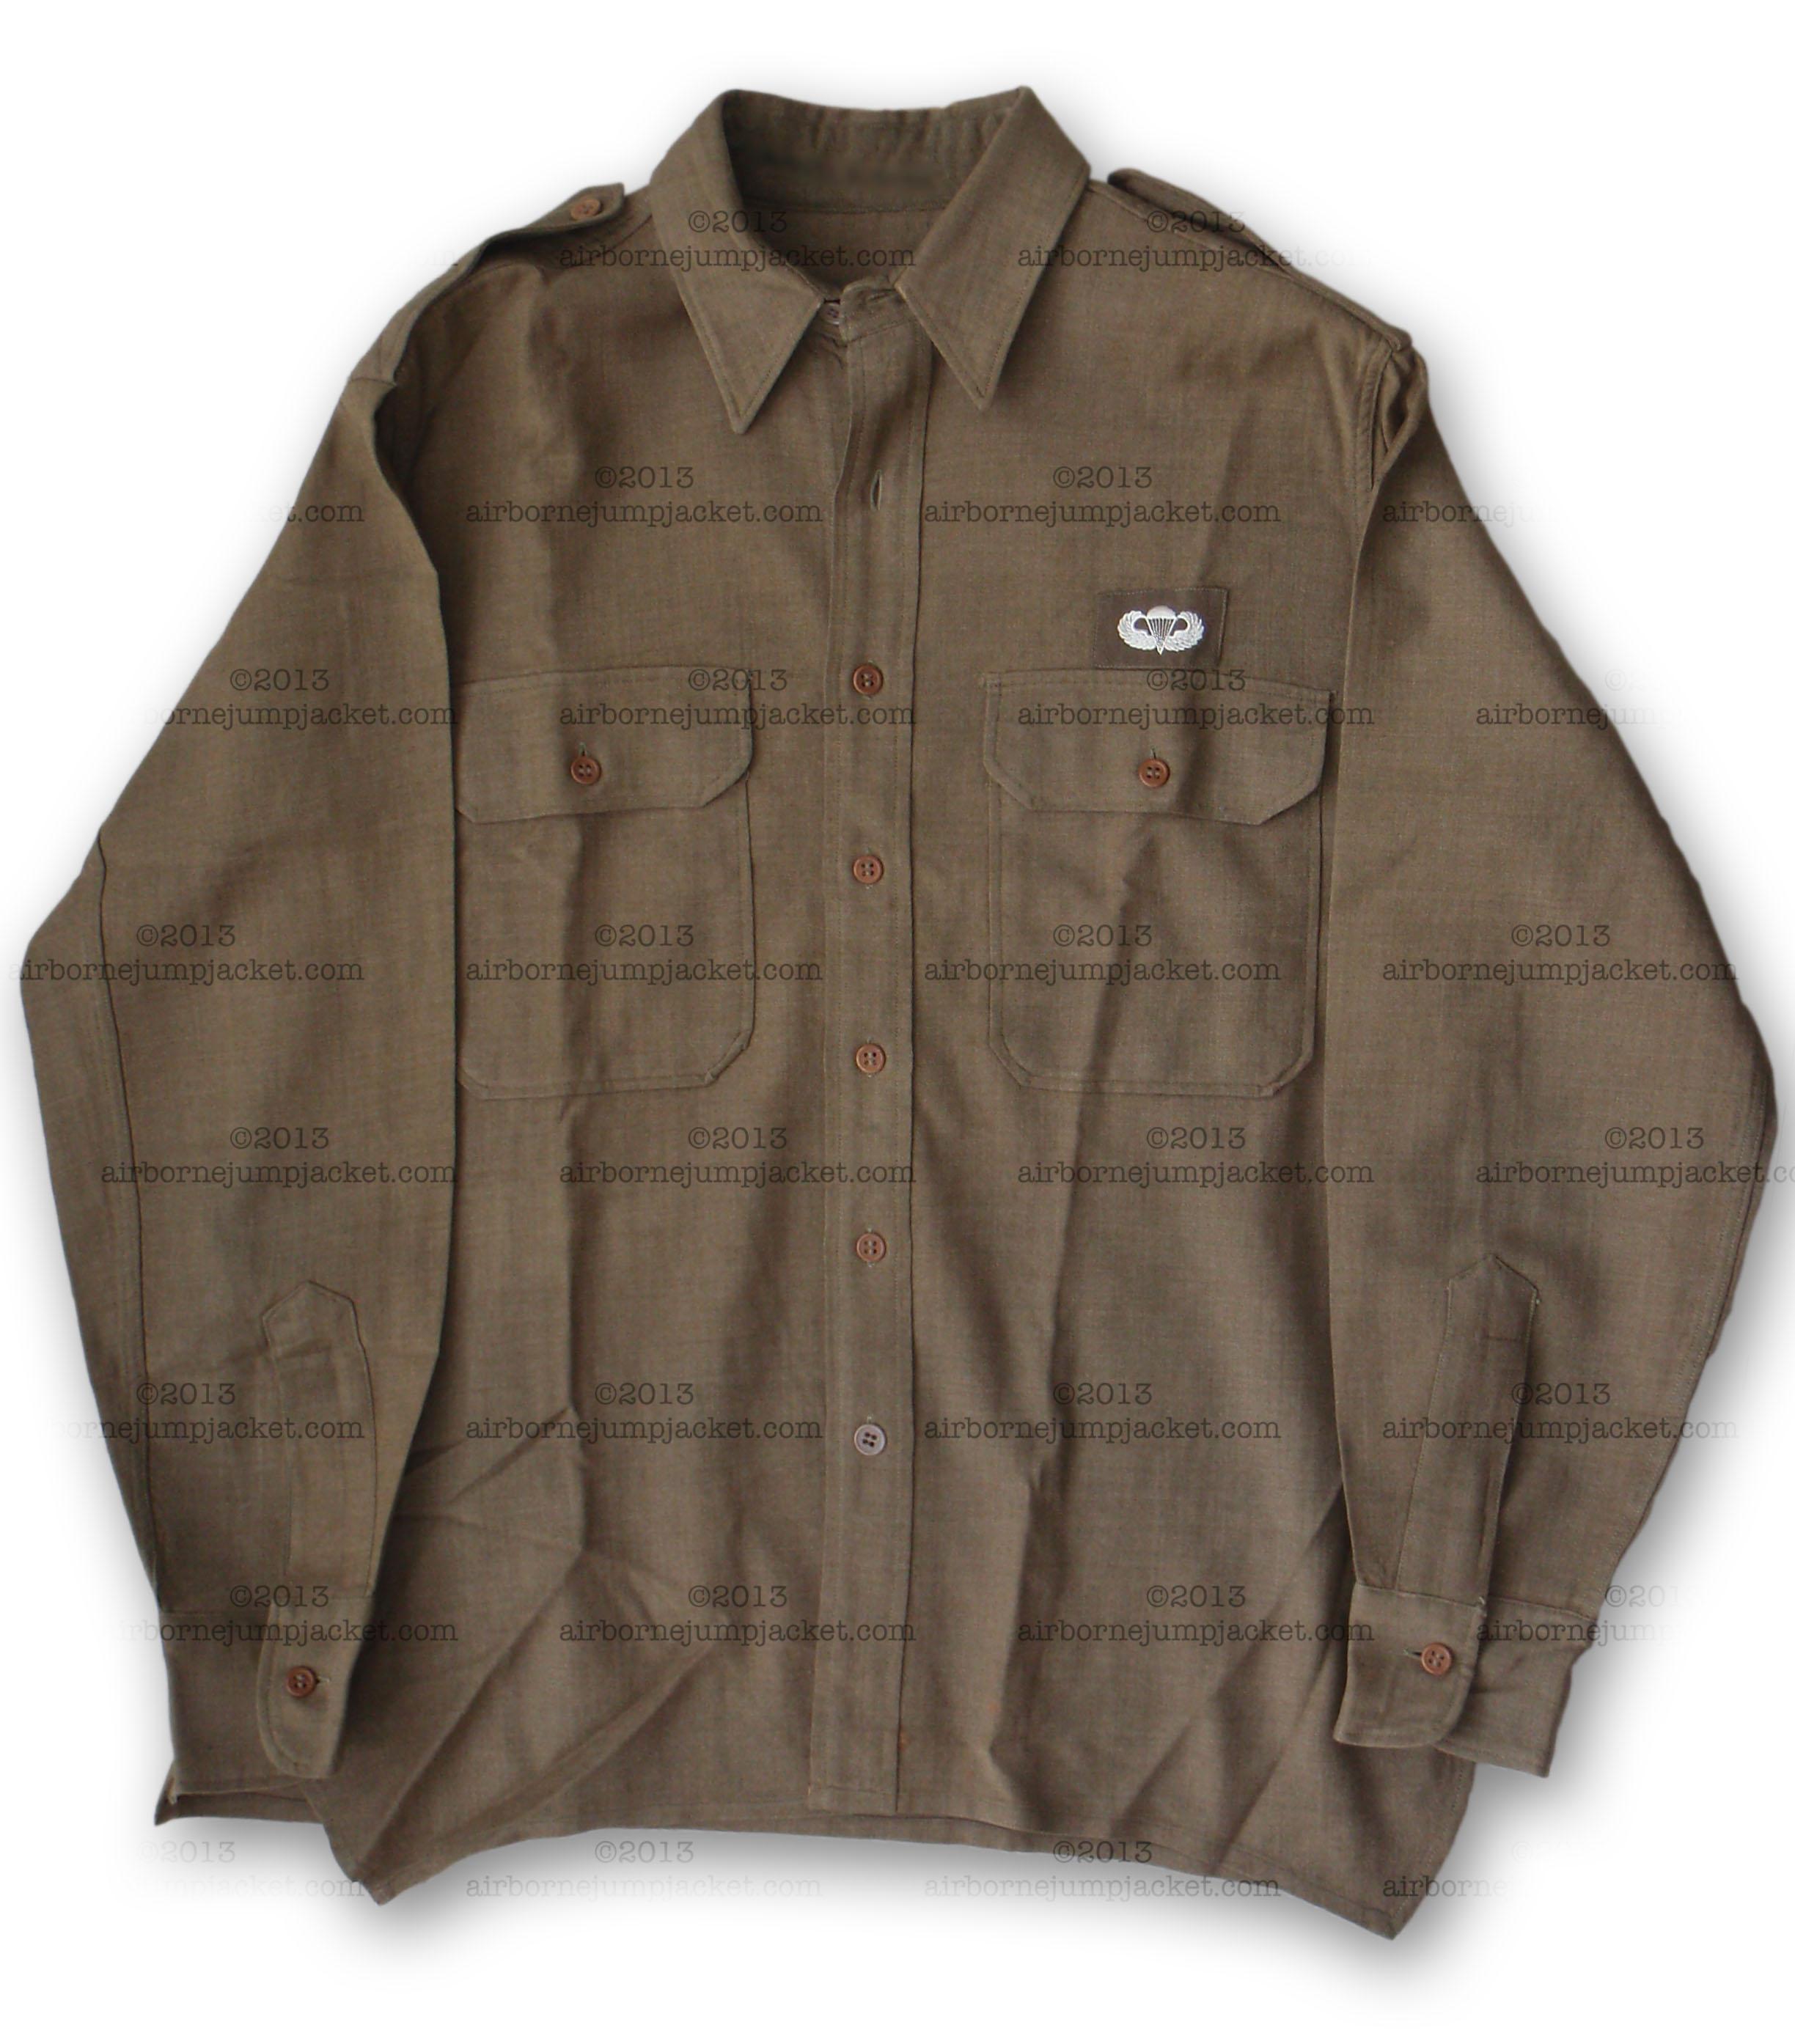 Airborne Dress Uniform 78